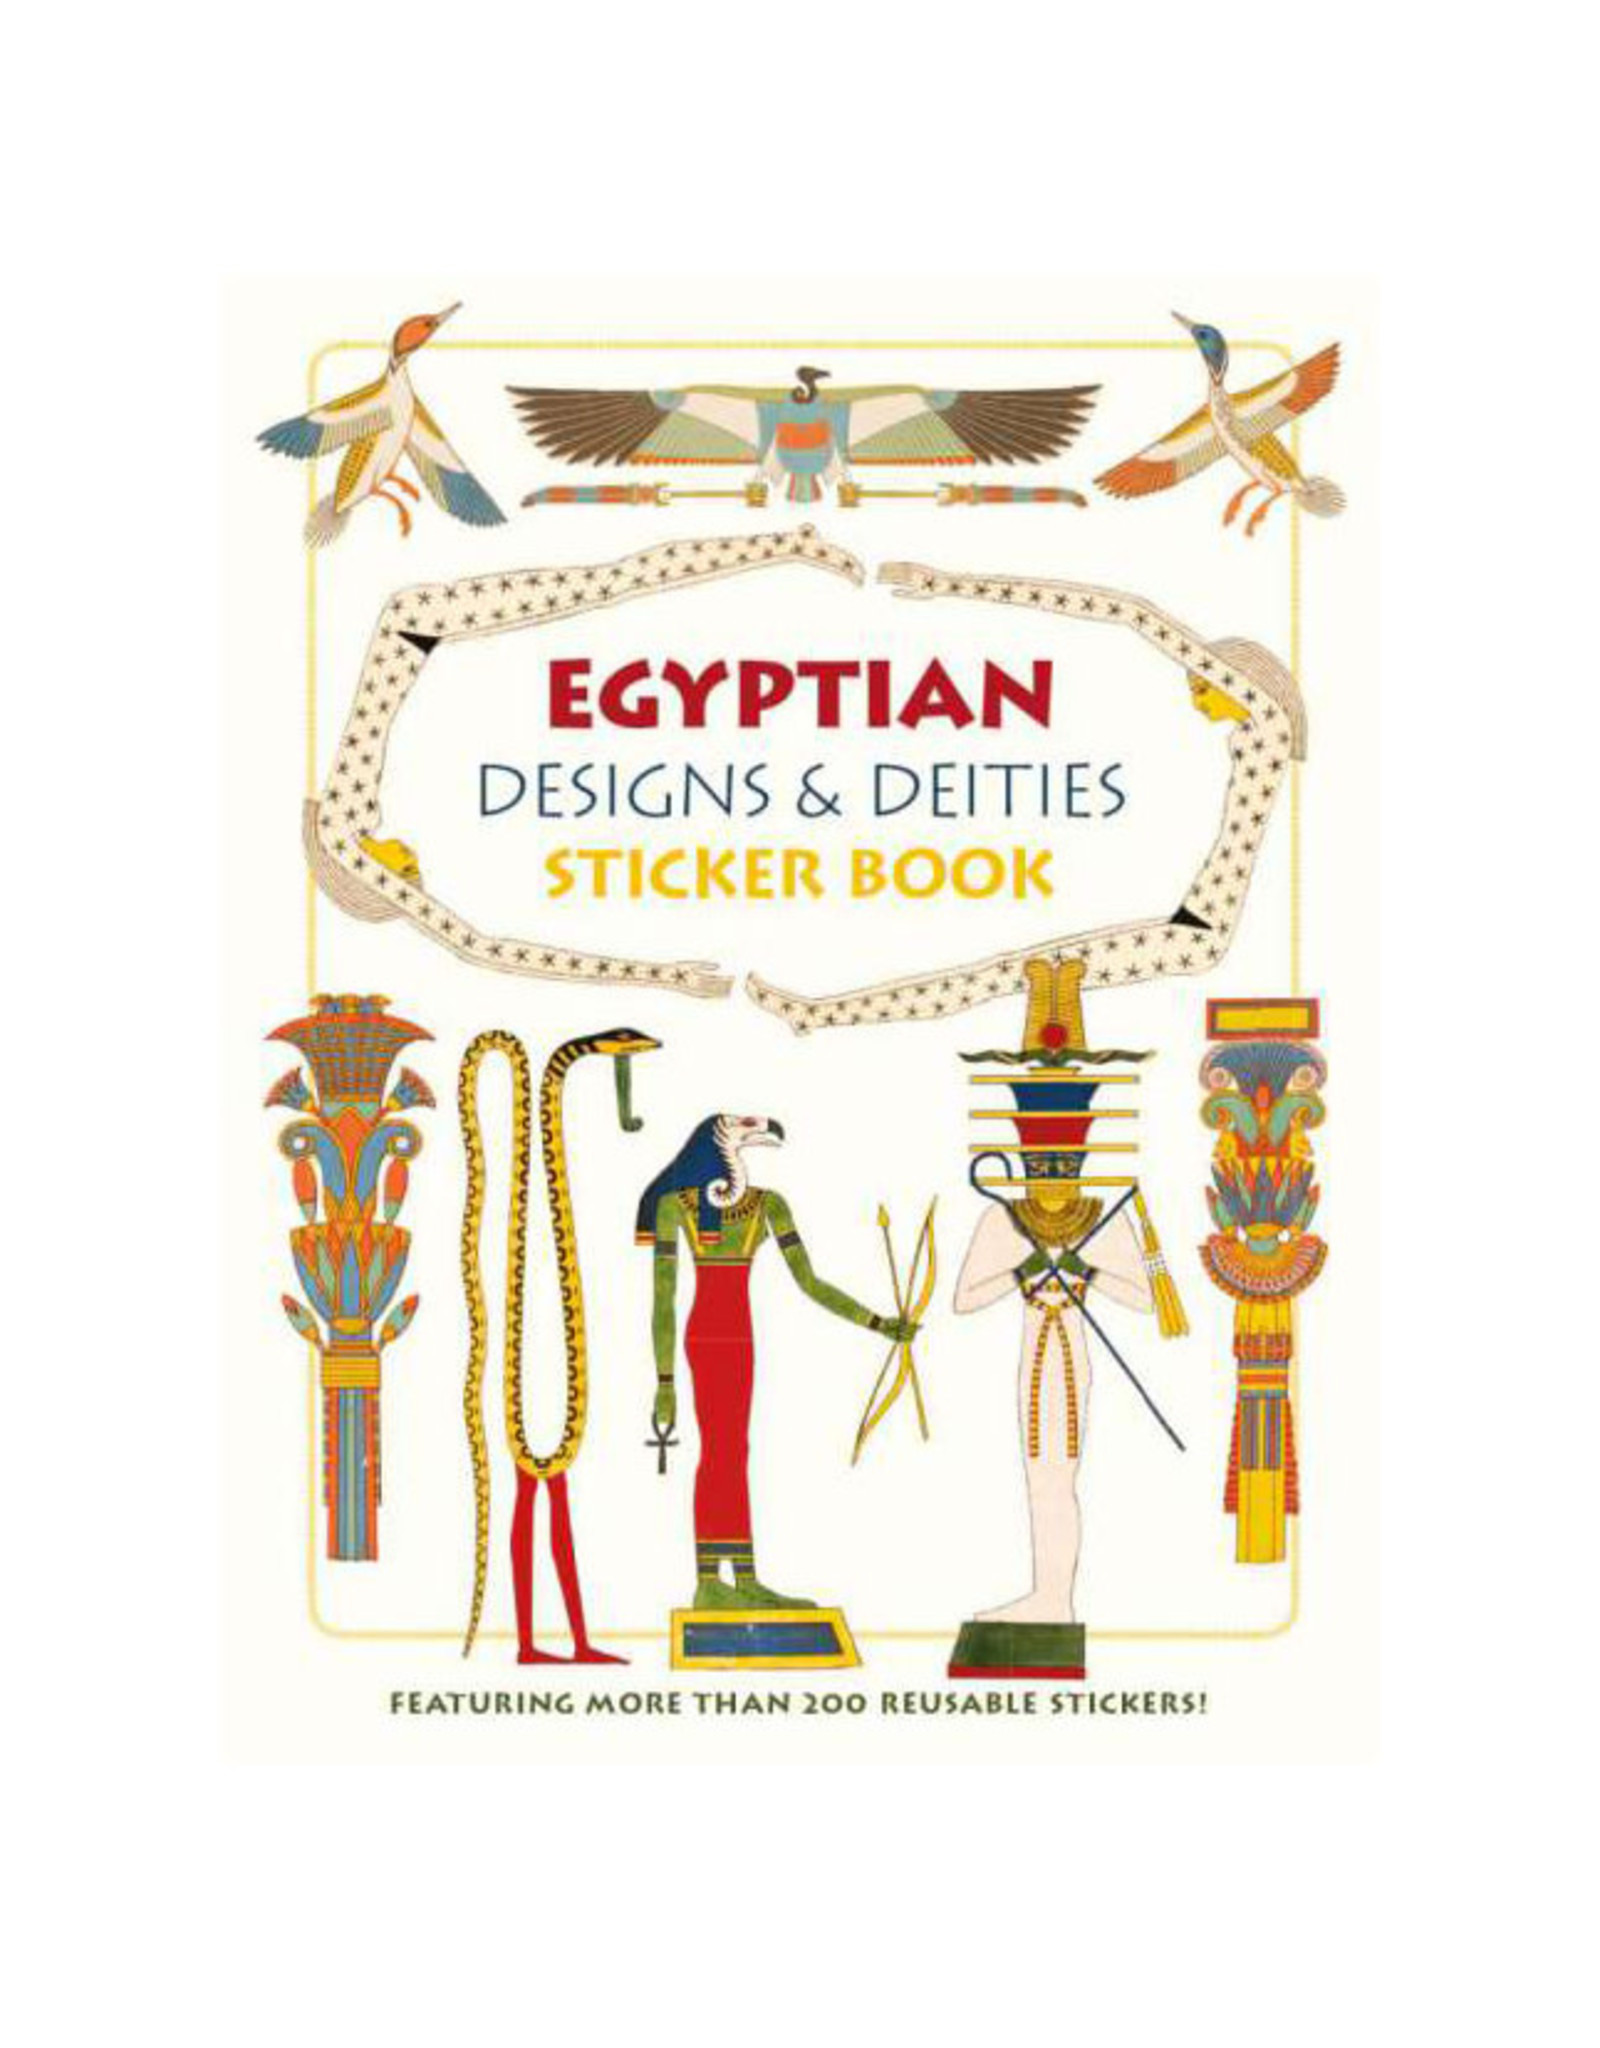 Pomegranate Egyptian Designs & Deities Sticker Book